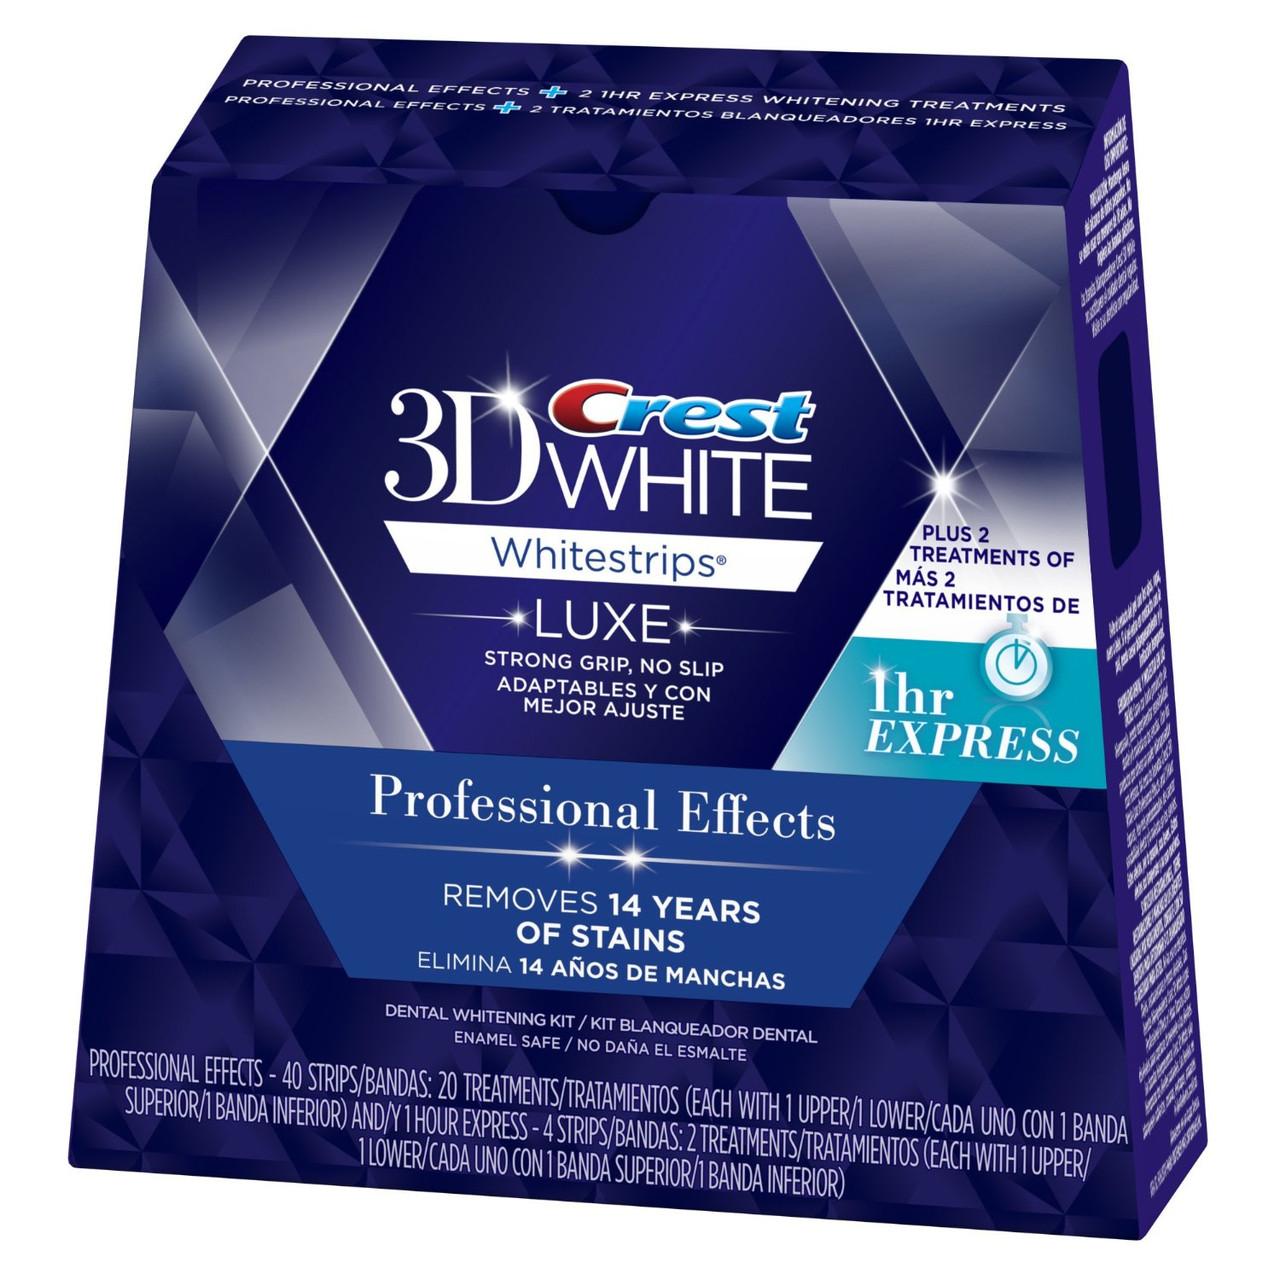 Crest 3D White Whitestrips Professional Effects - Отбеливающие полоски для зубов (40 полосок)